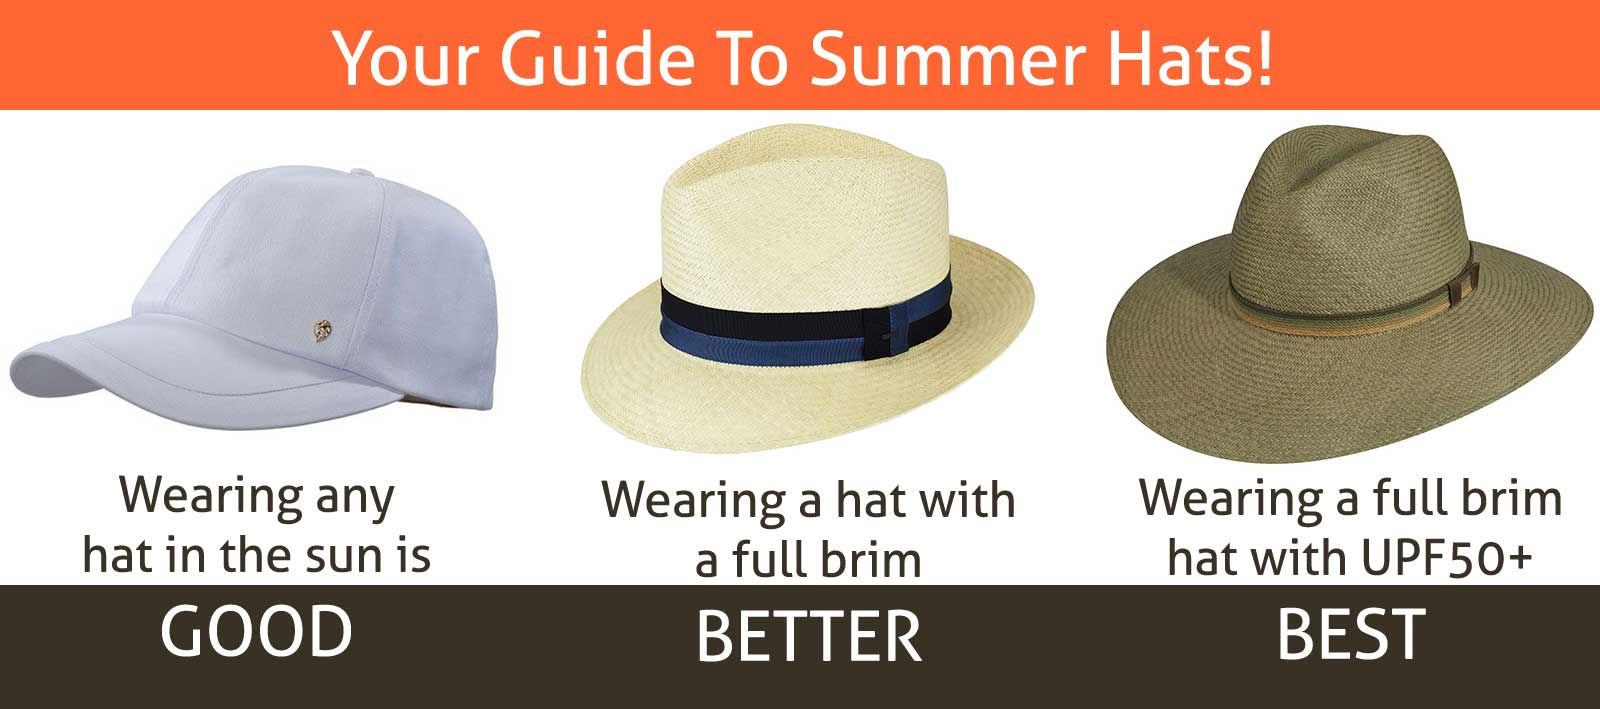 Summer Hat Guide